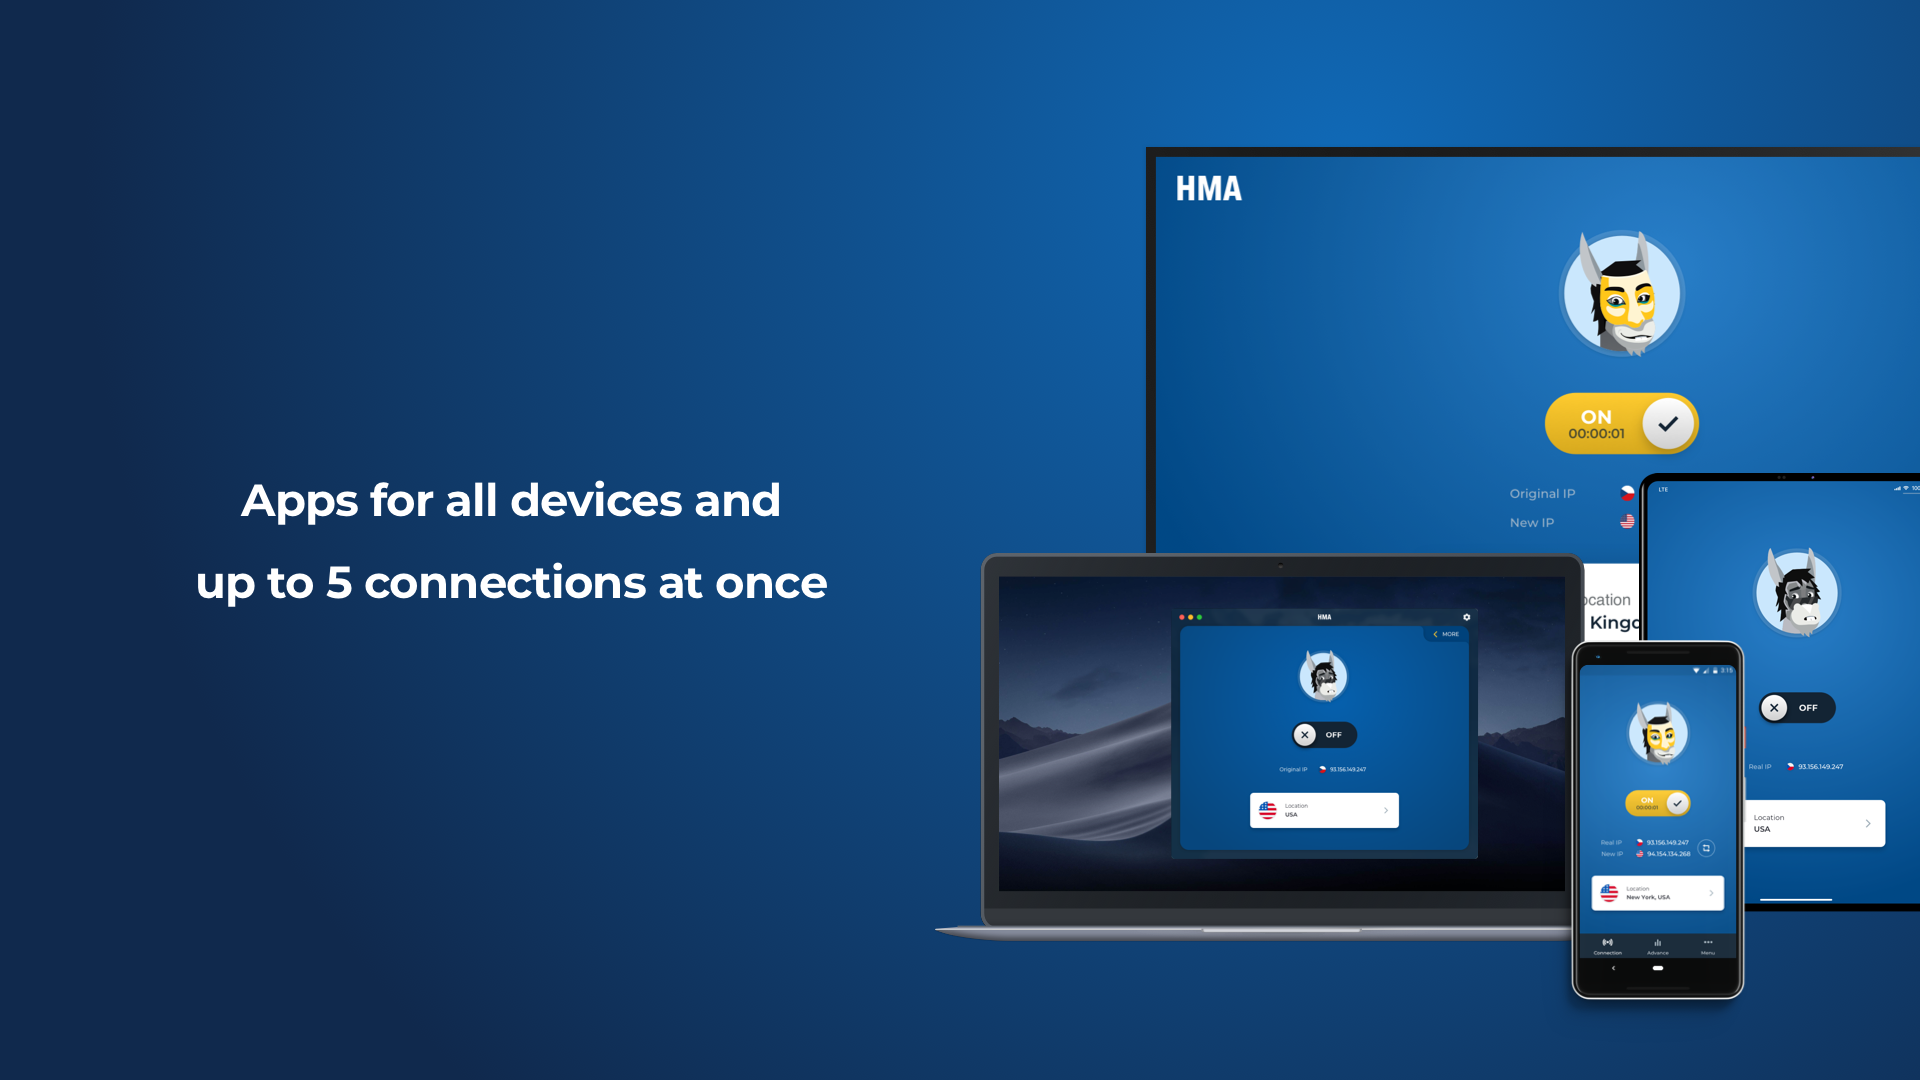 1d67c5581f8247e5c08f4a67af9d6578 - Does A Vpn Cover All Devices